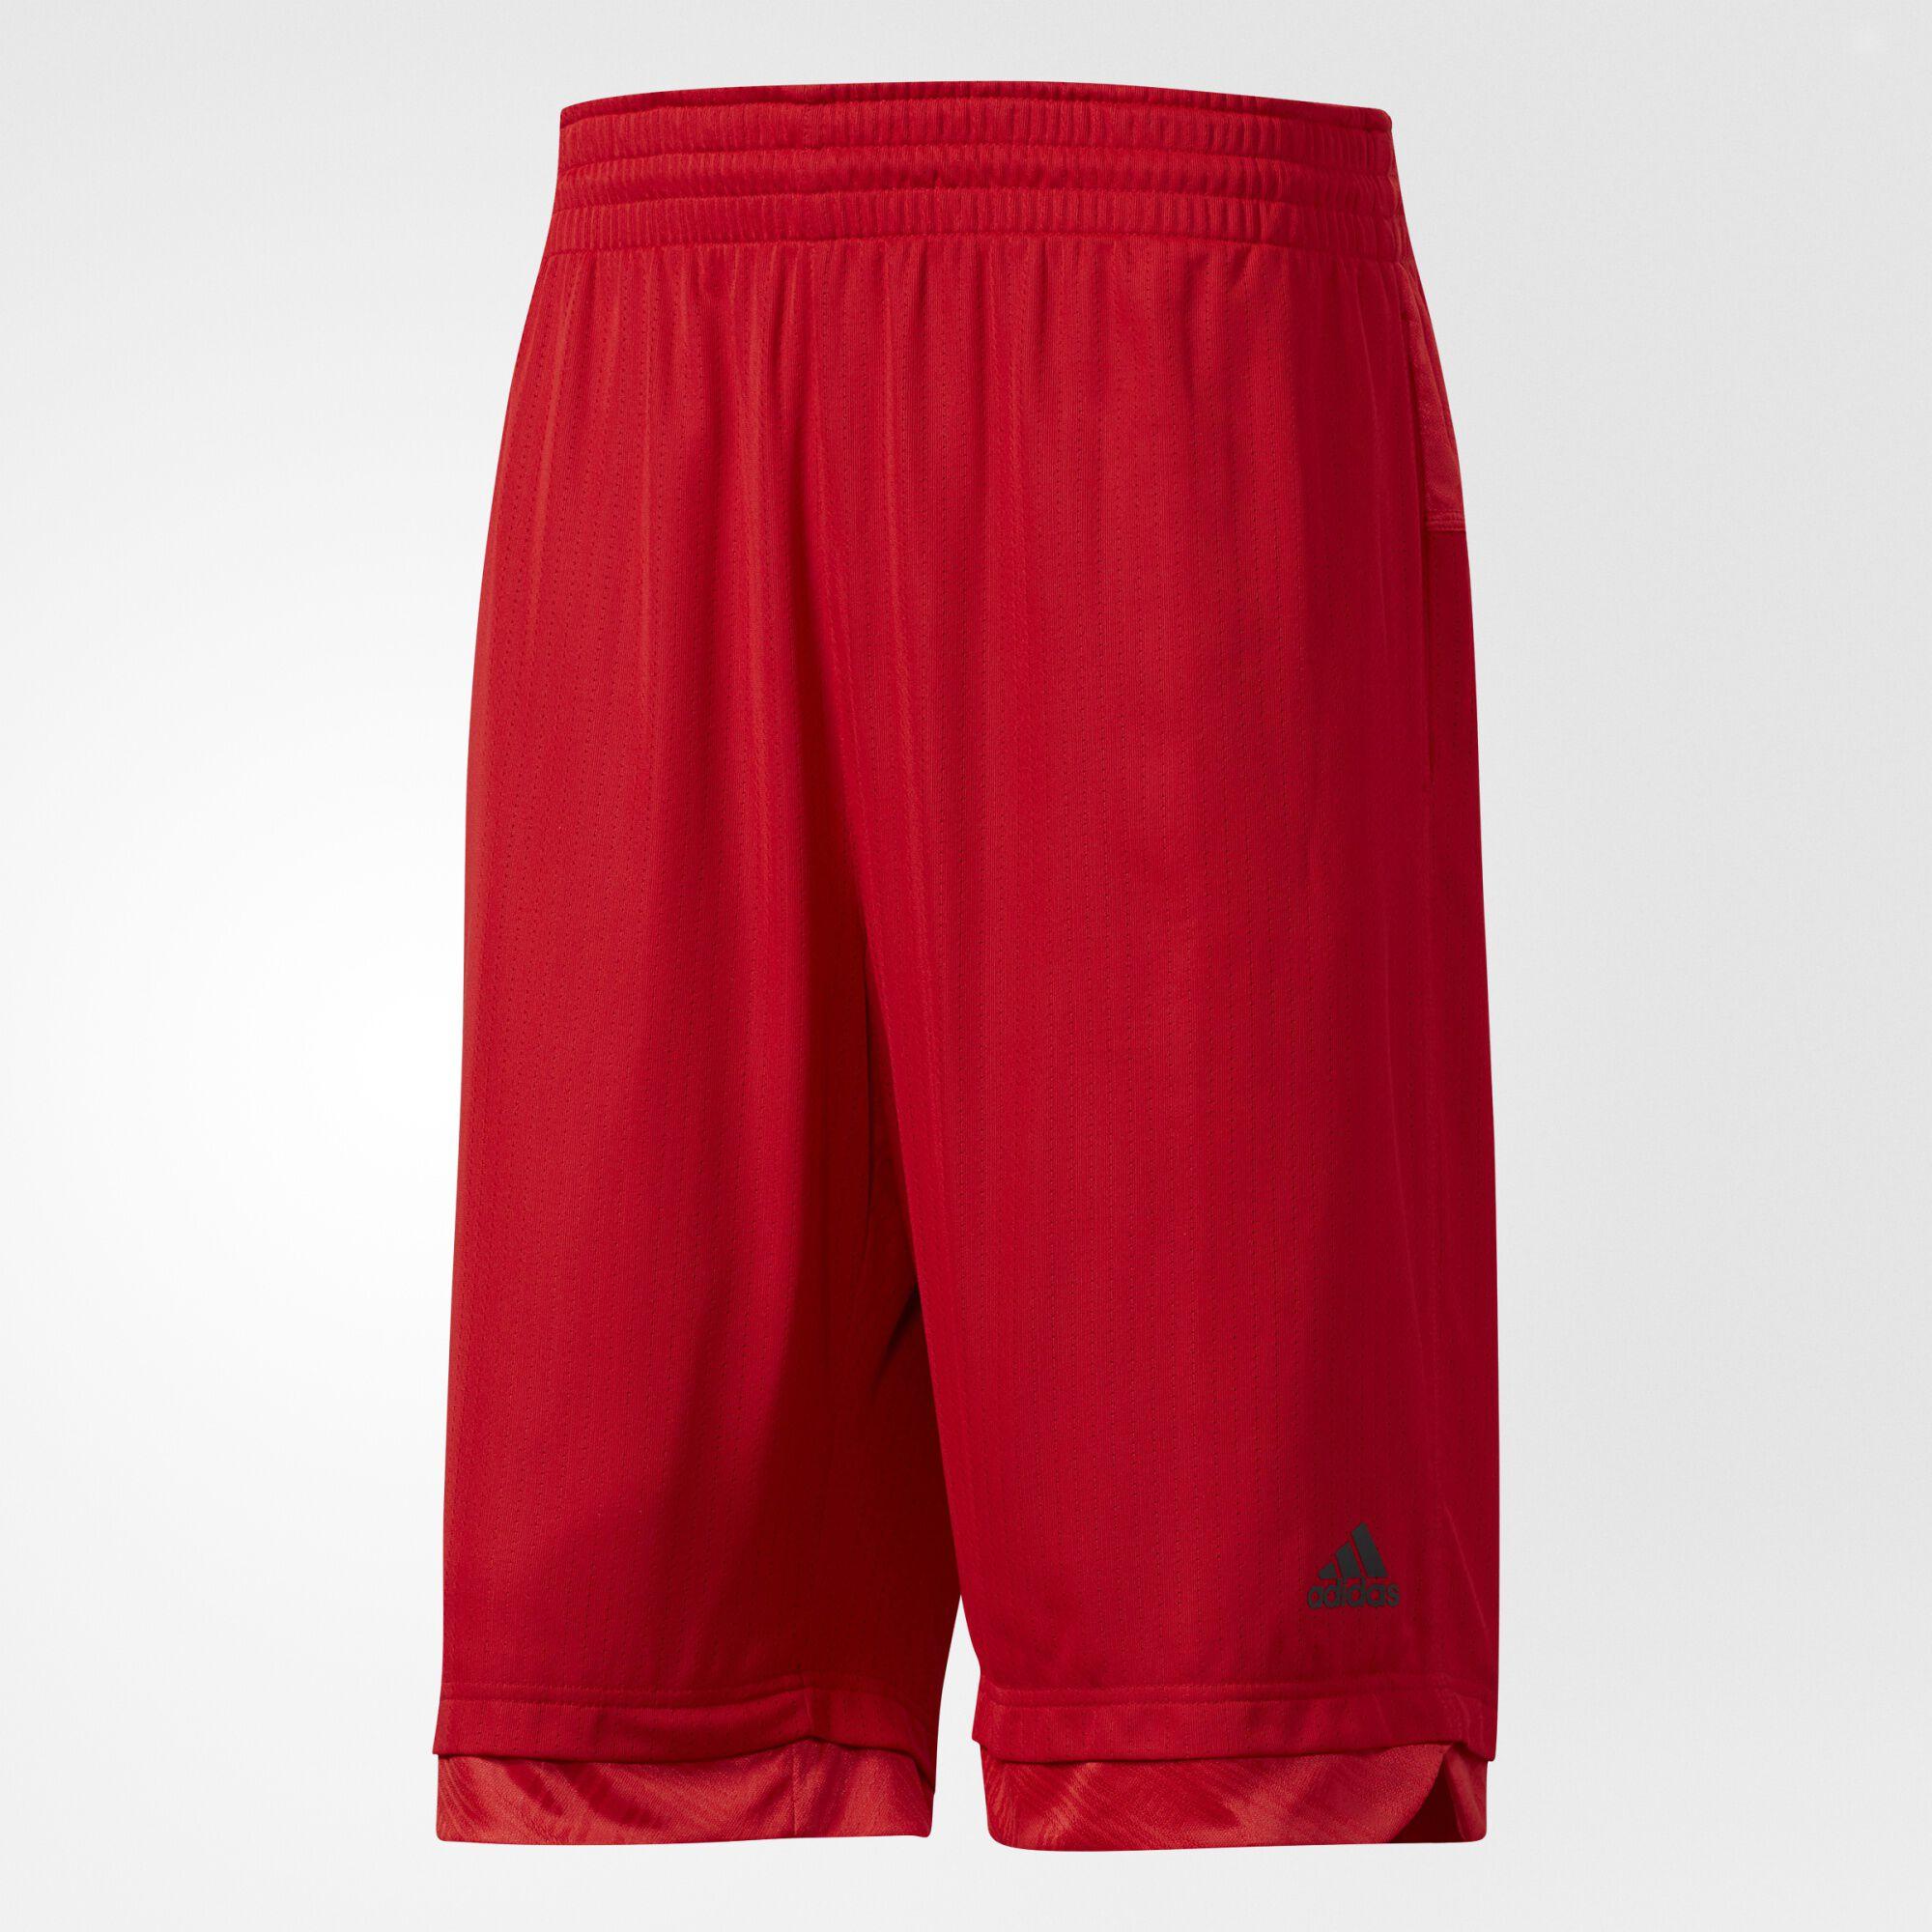 adidas Dame Icon Shorts Men 039 s Red